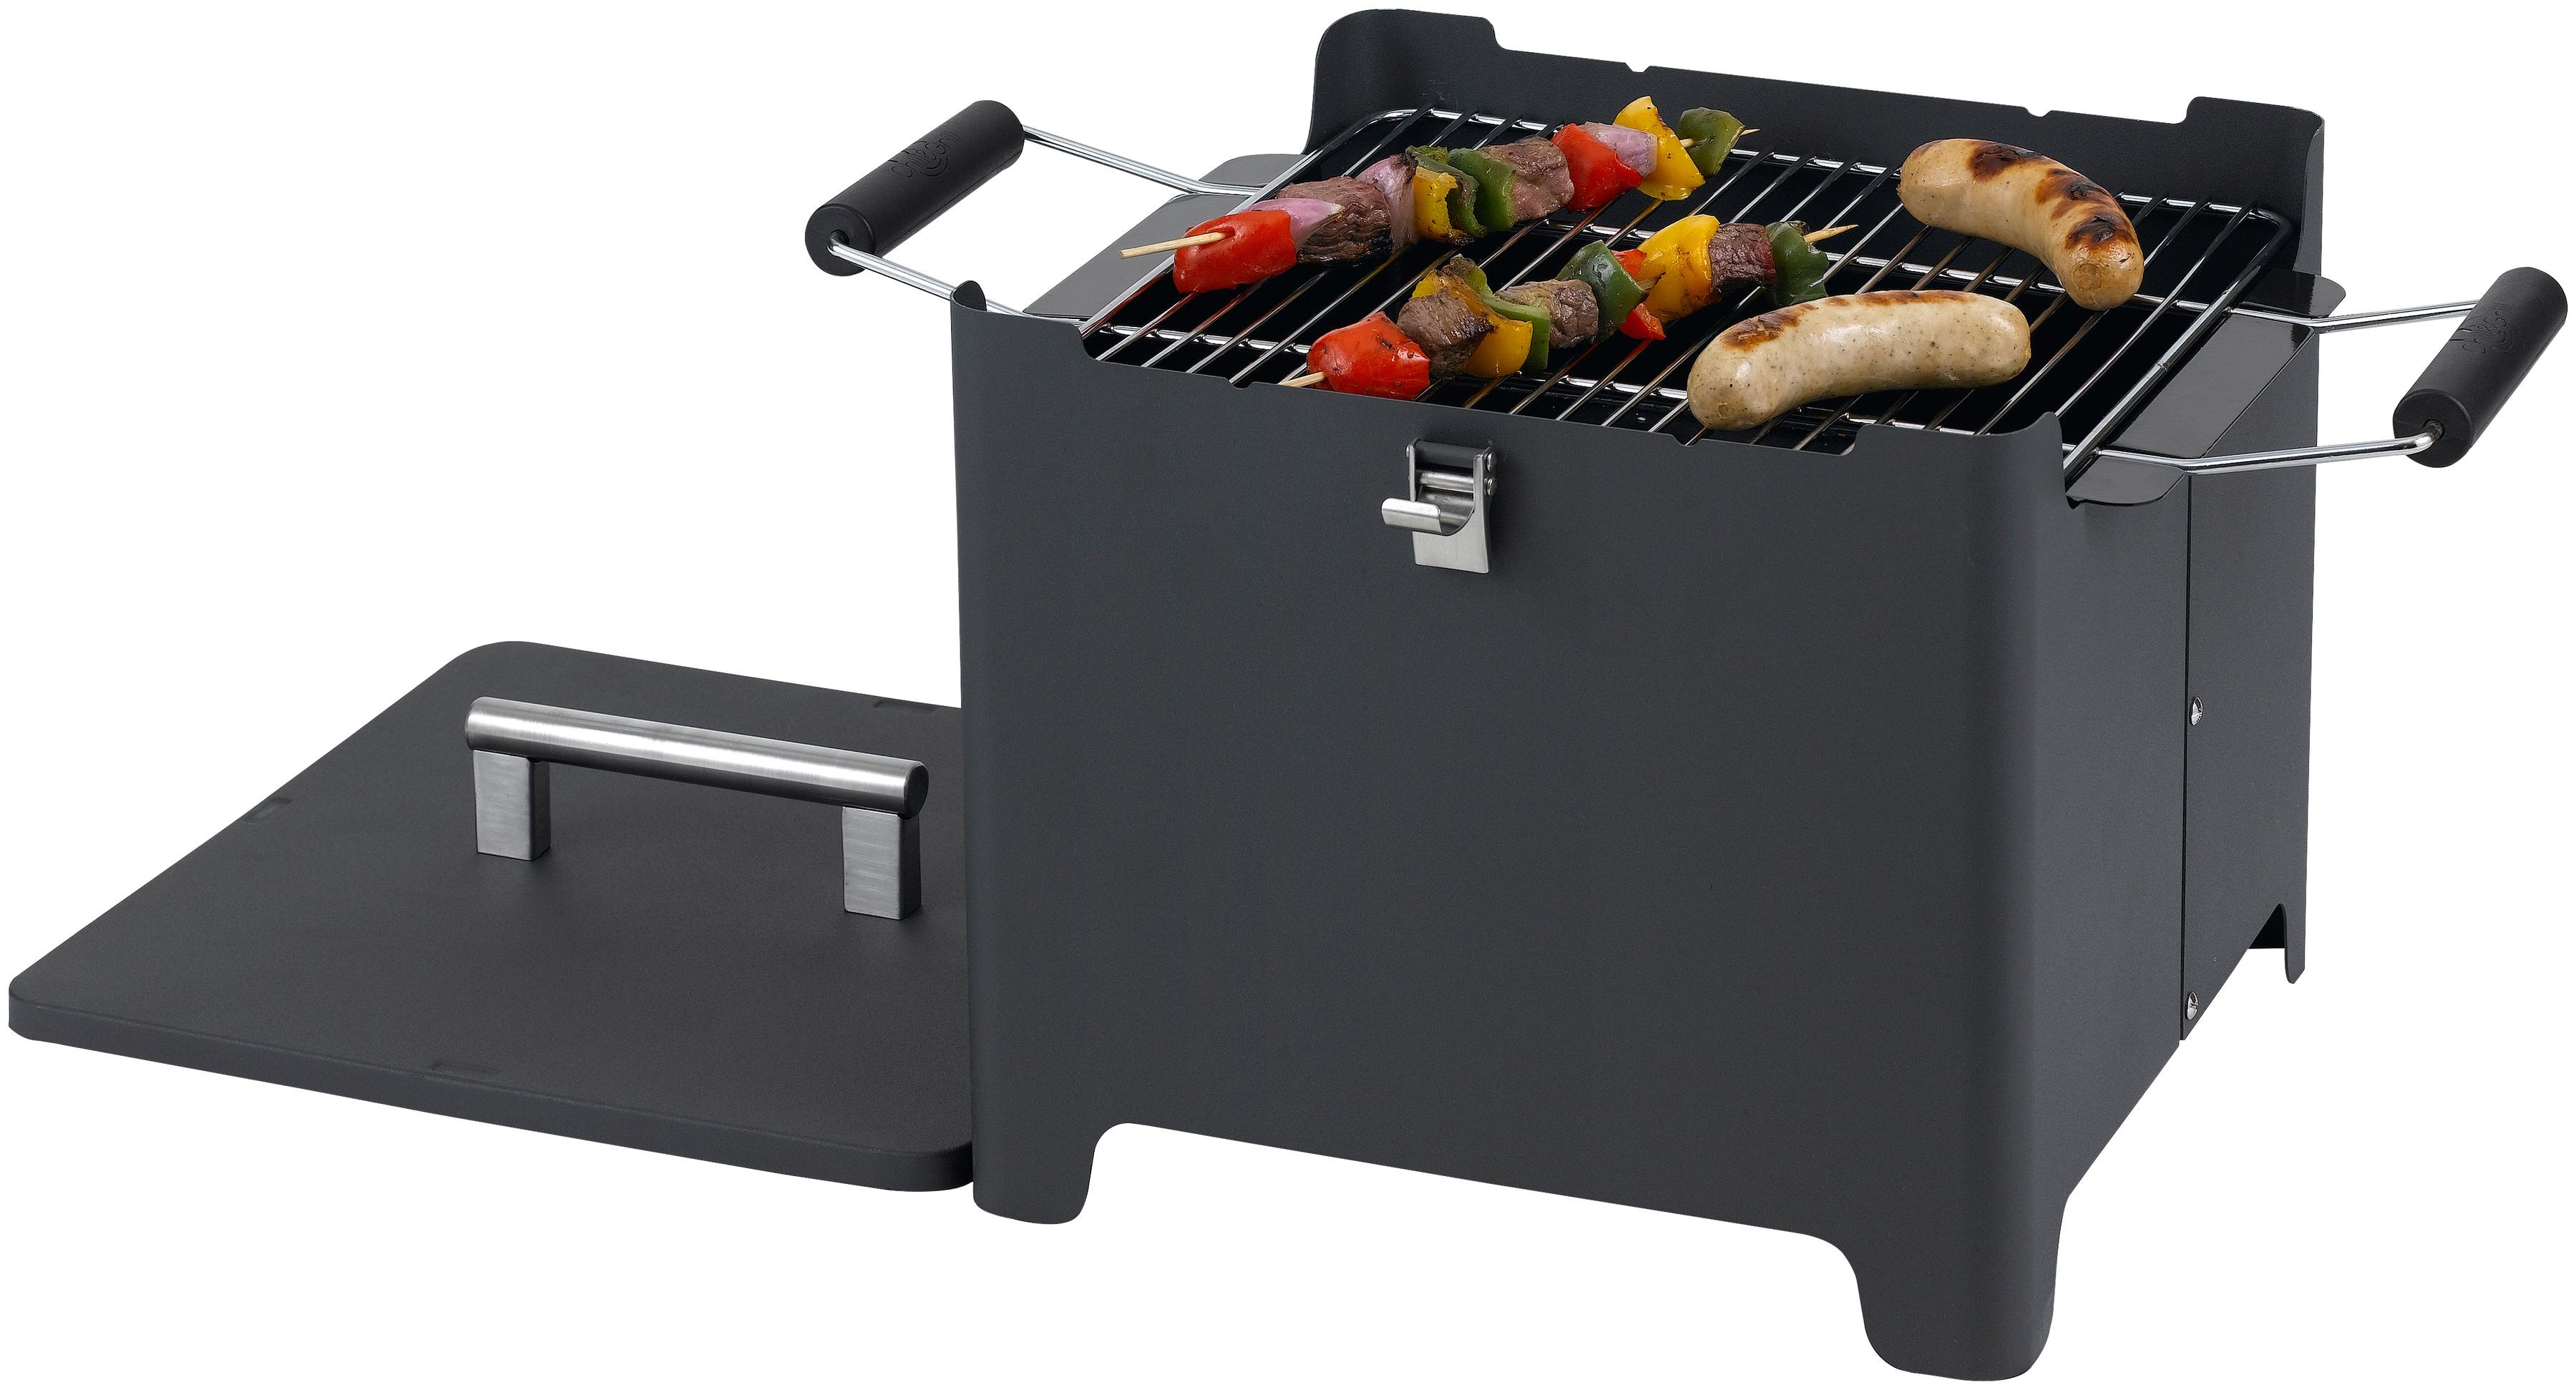 Napoleon Holzkohlegrill Pro605css Edelstahl : Kohle stahl grillgeräte online kaufen möbel suchmaschine